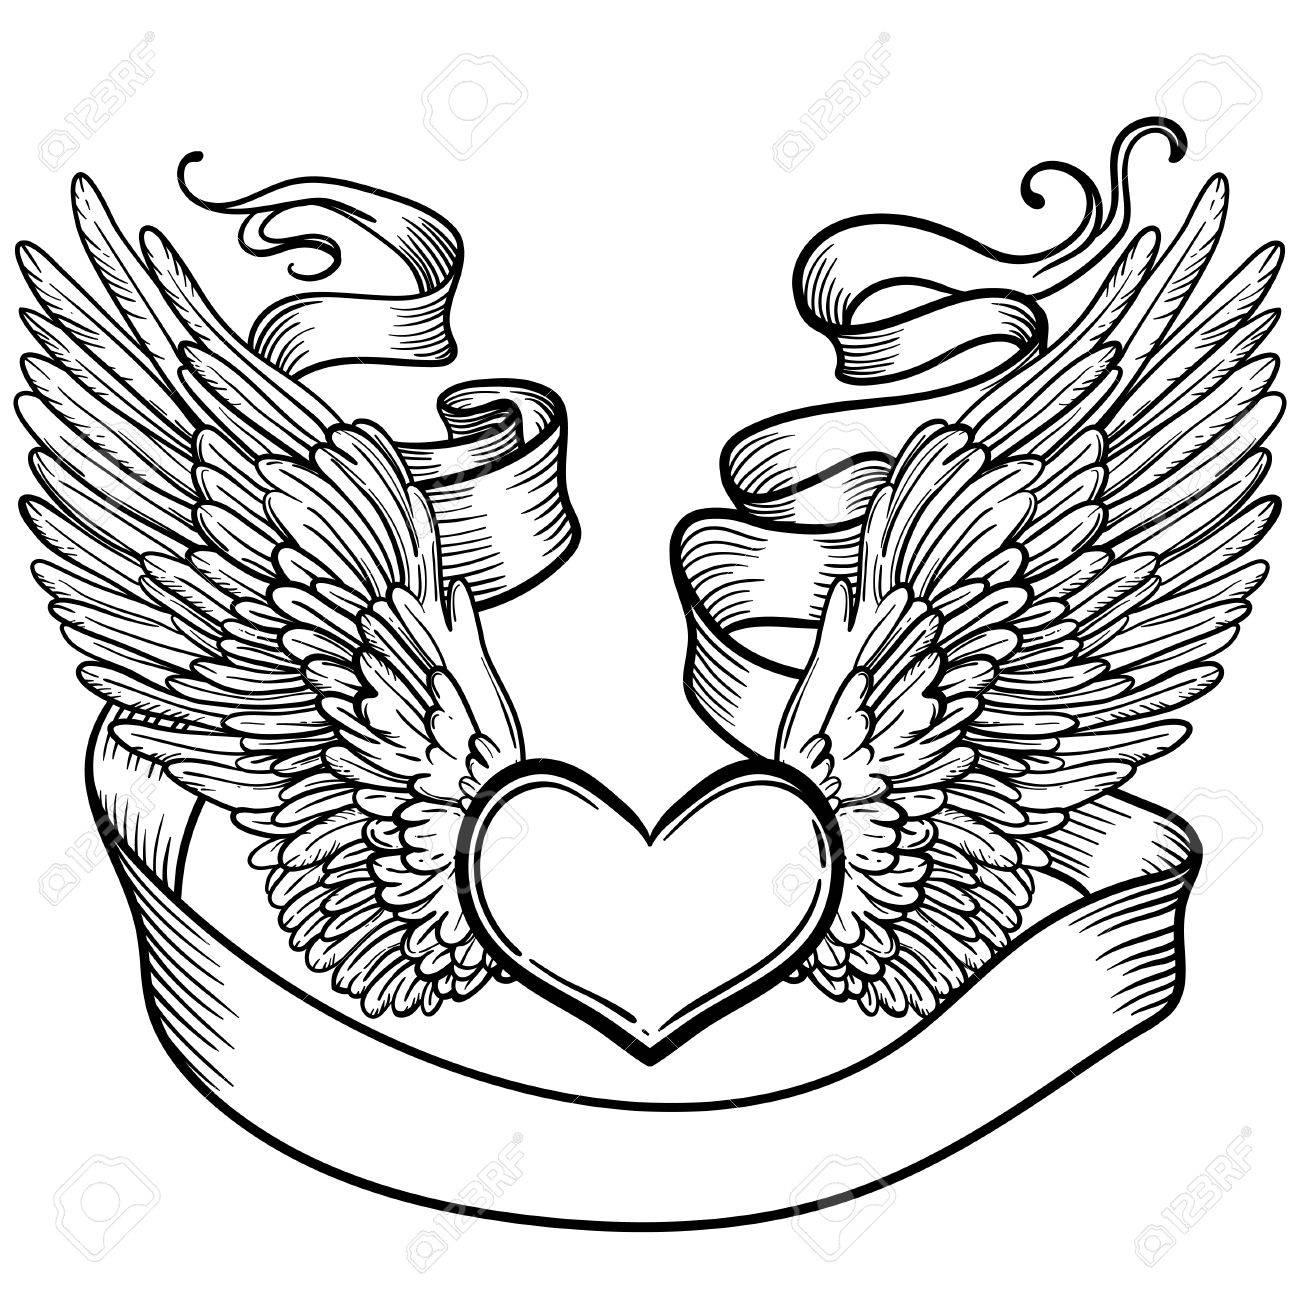 1300x1300 Line Art Illustration Of Angel Wings, Heart, Tape. Vintage Print